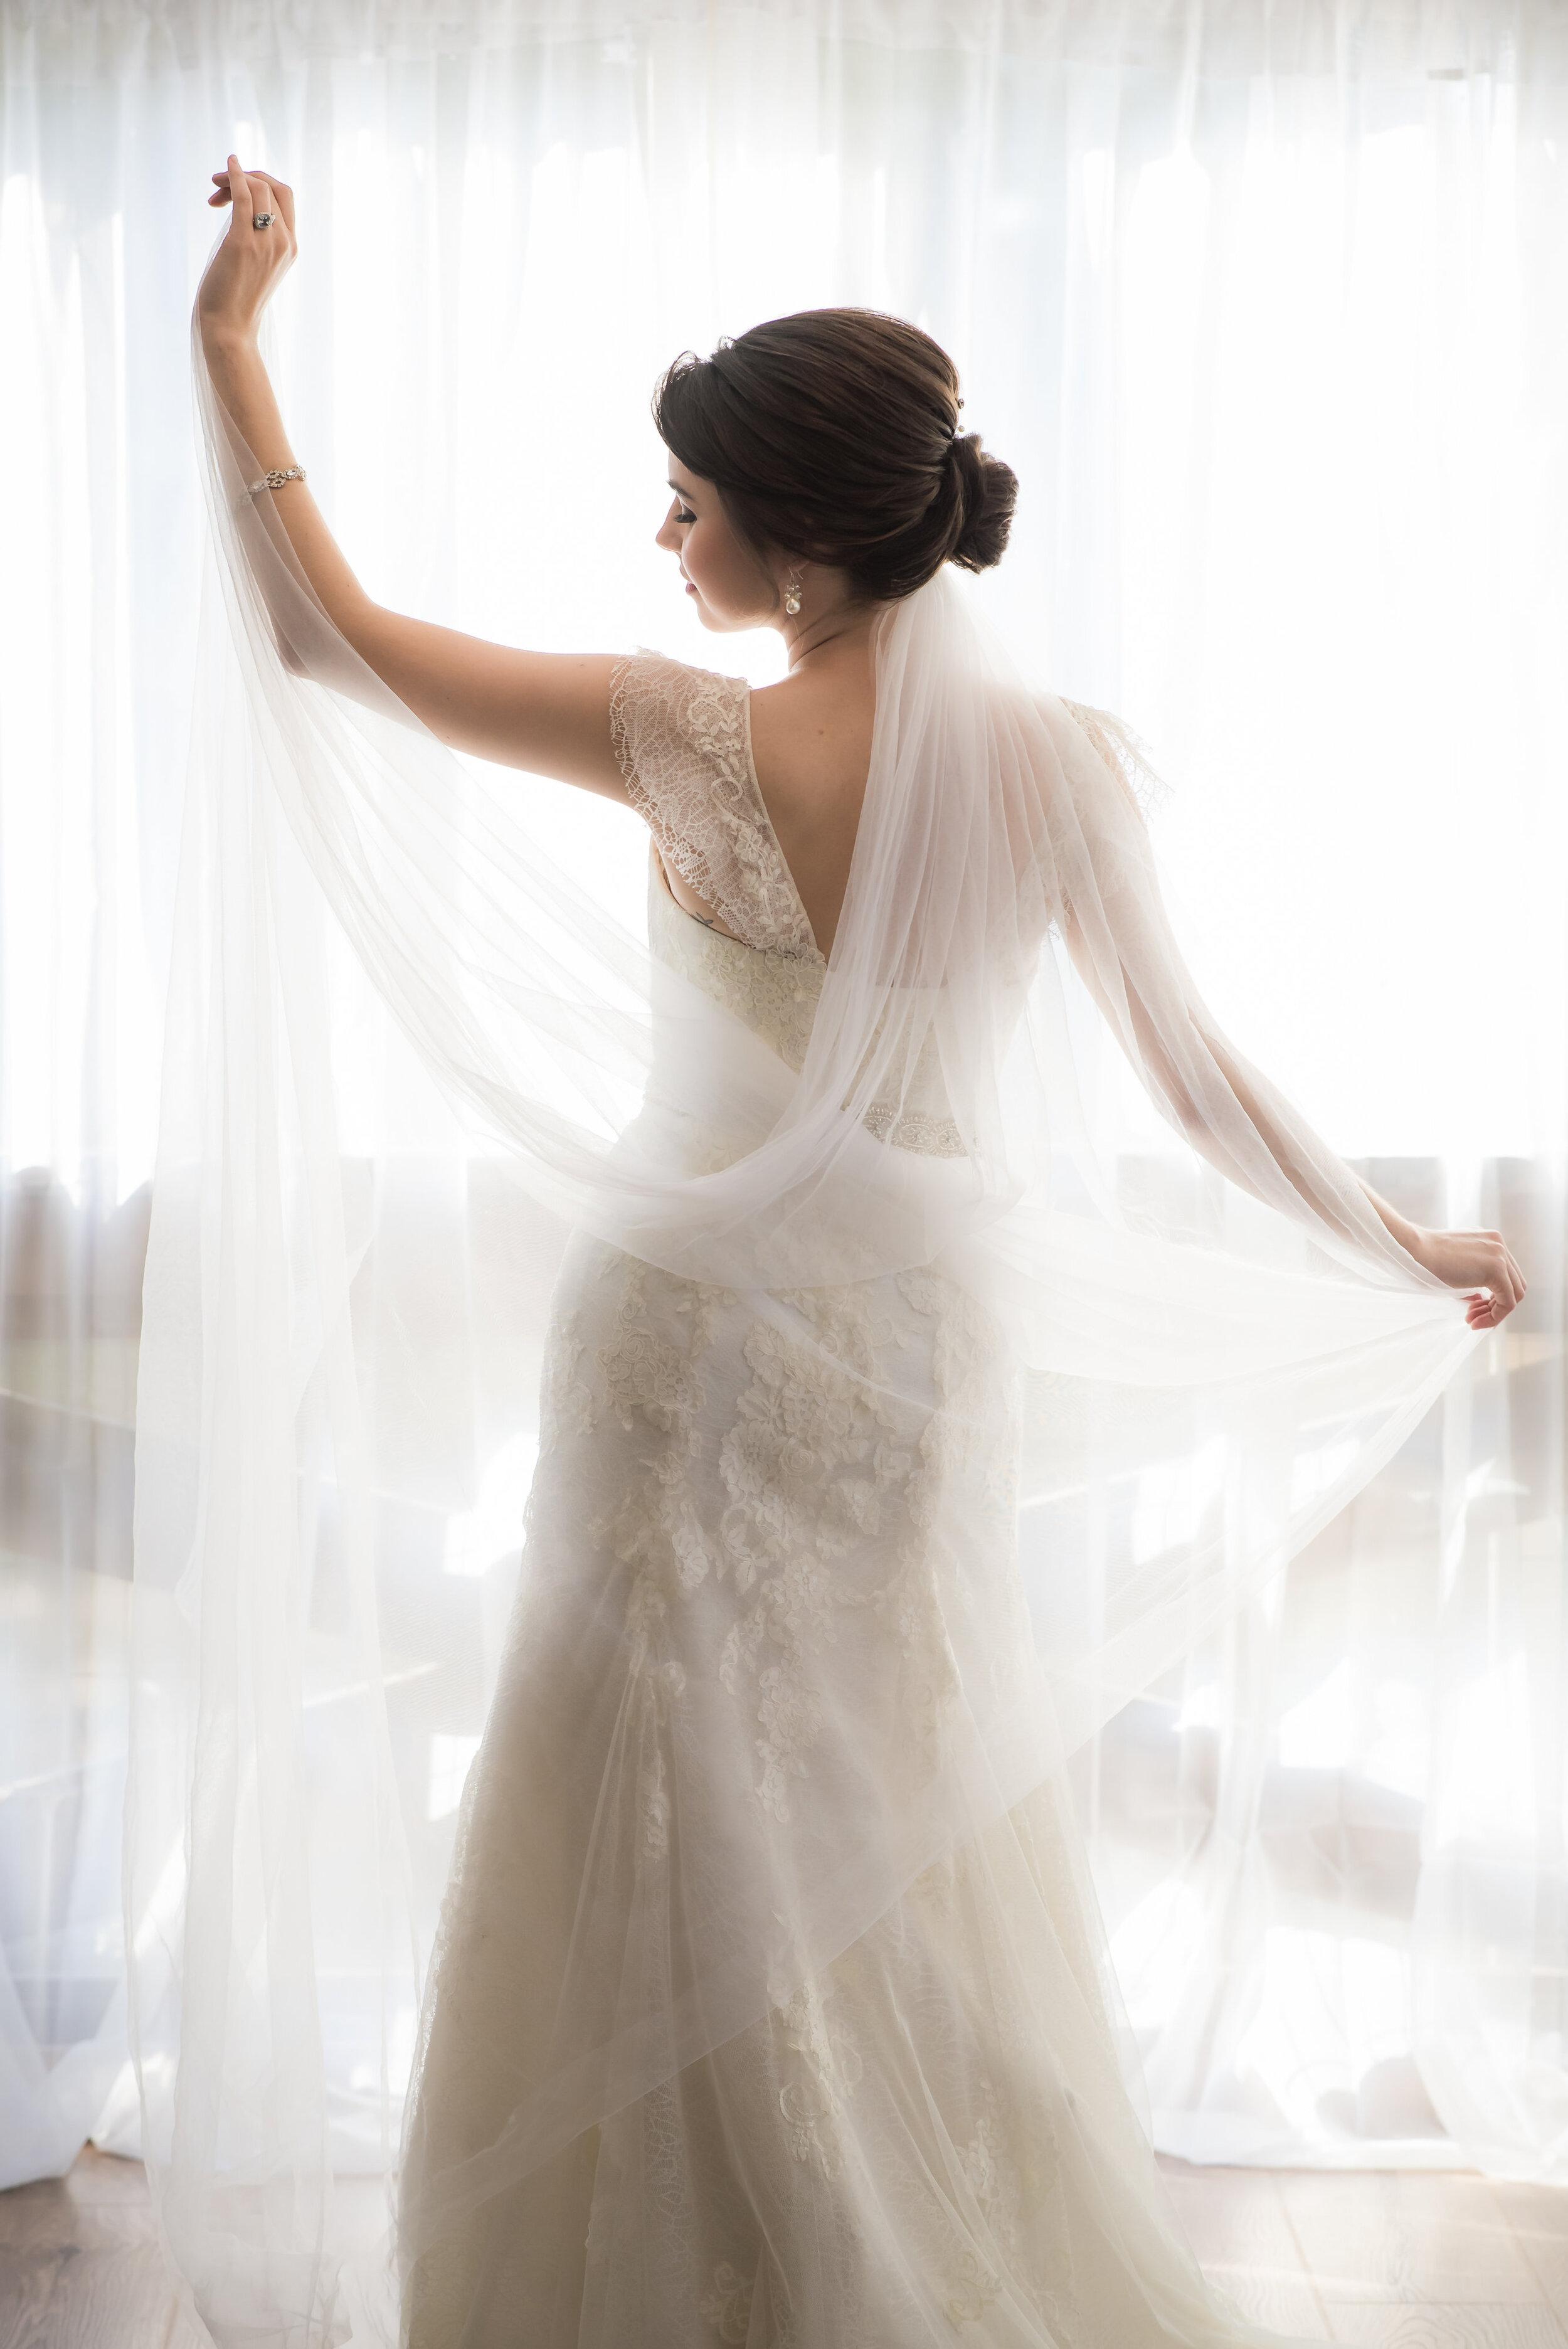 PHOTOGRAPHER: Adrea Thomas Photography -- www.adreathomas.com -- IG: adreathomasphoto  MODEL: Julia —IG: julesblairr